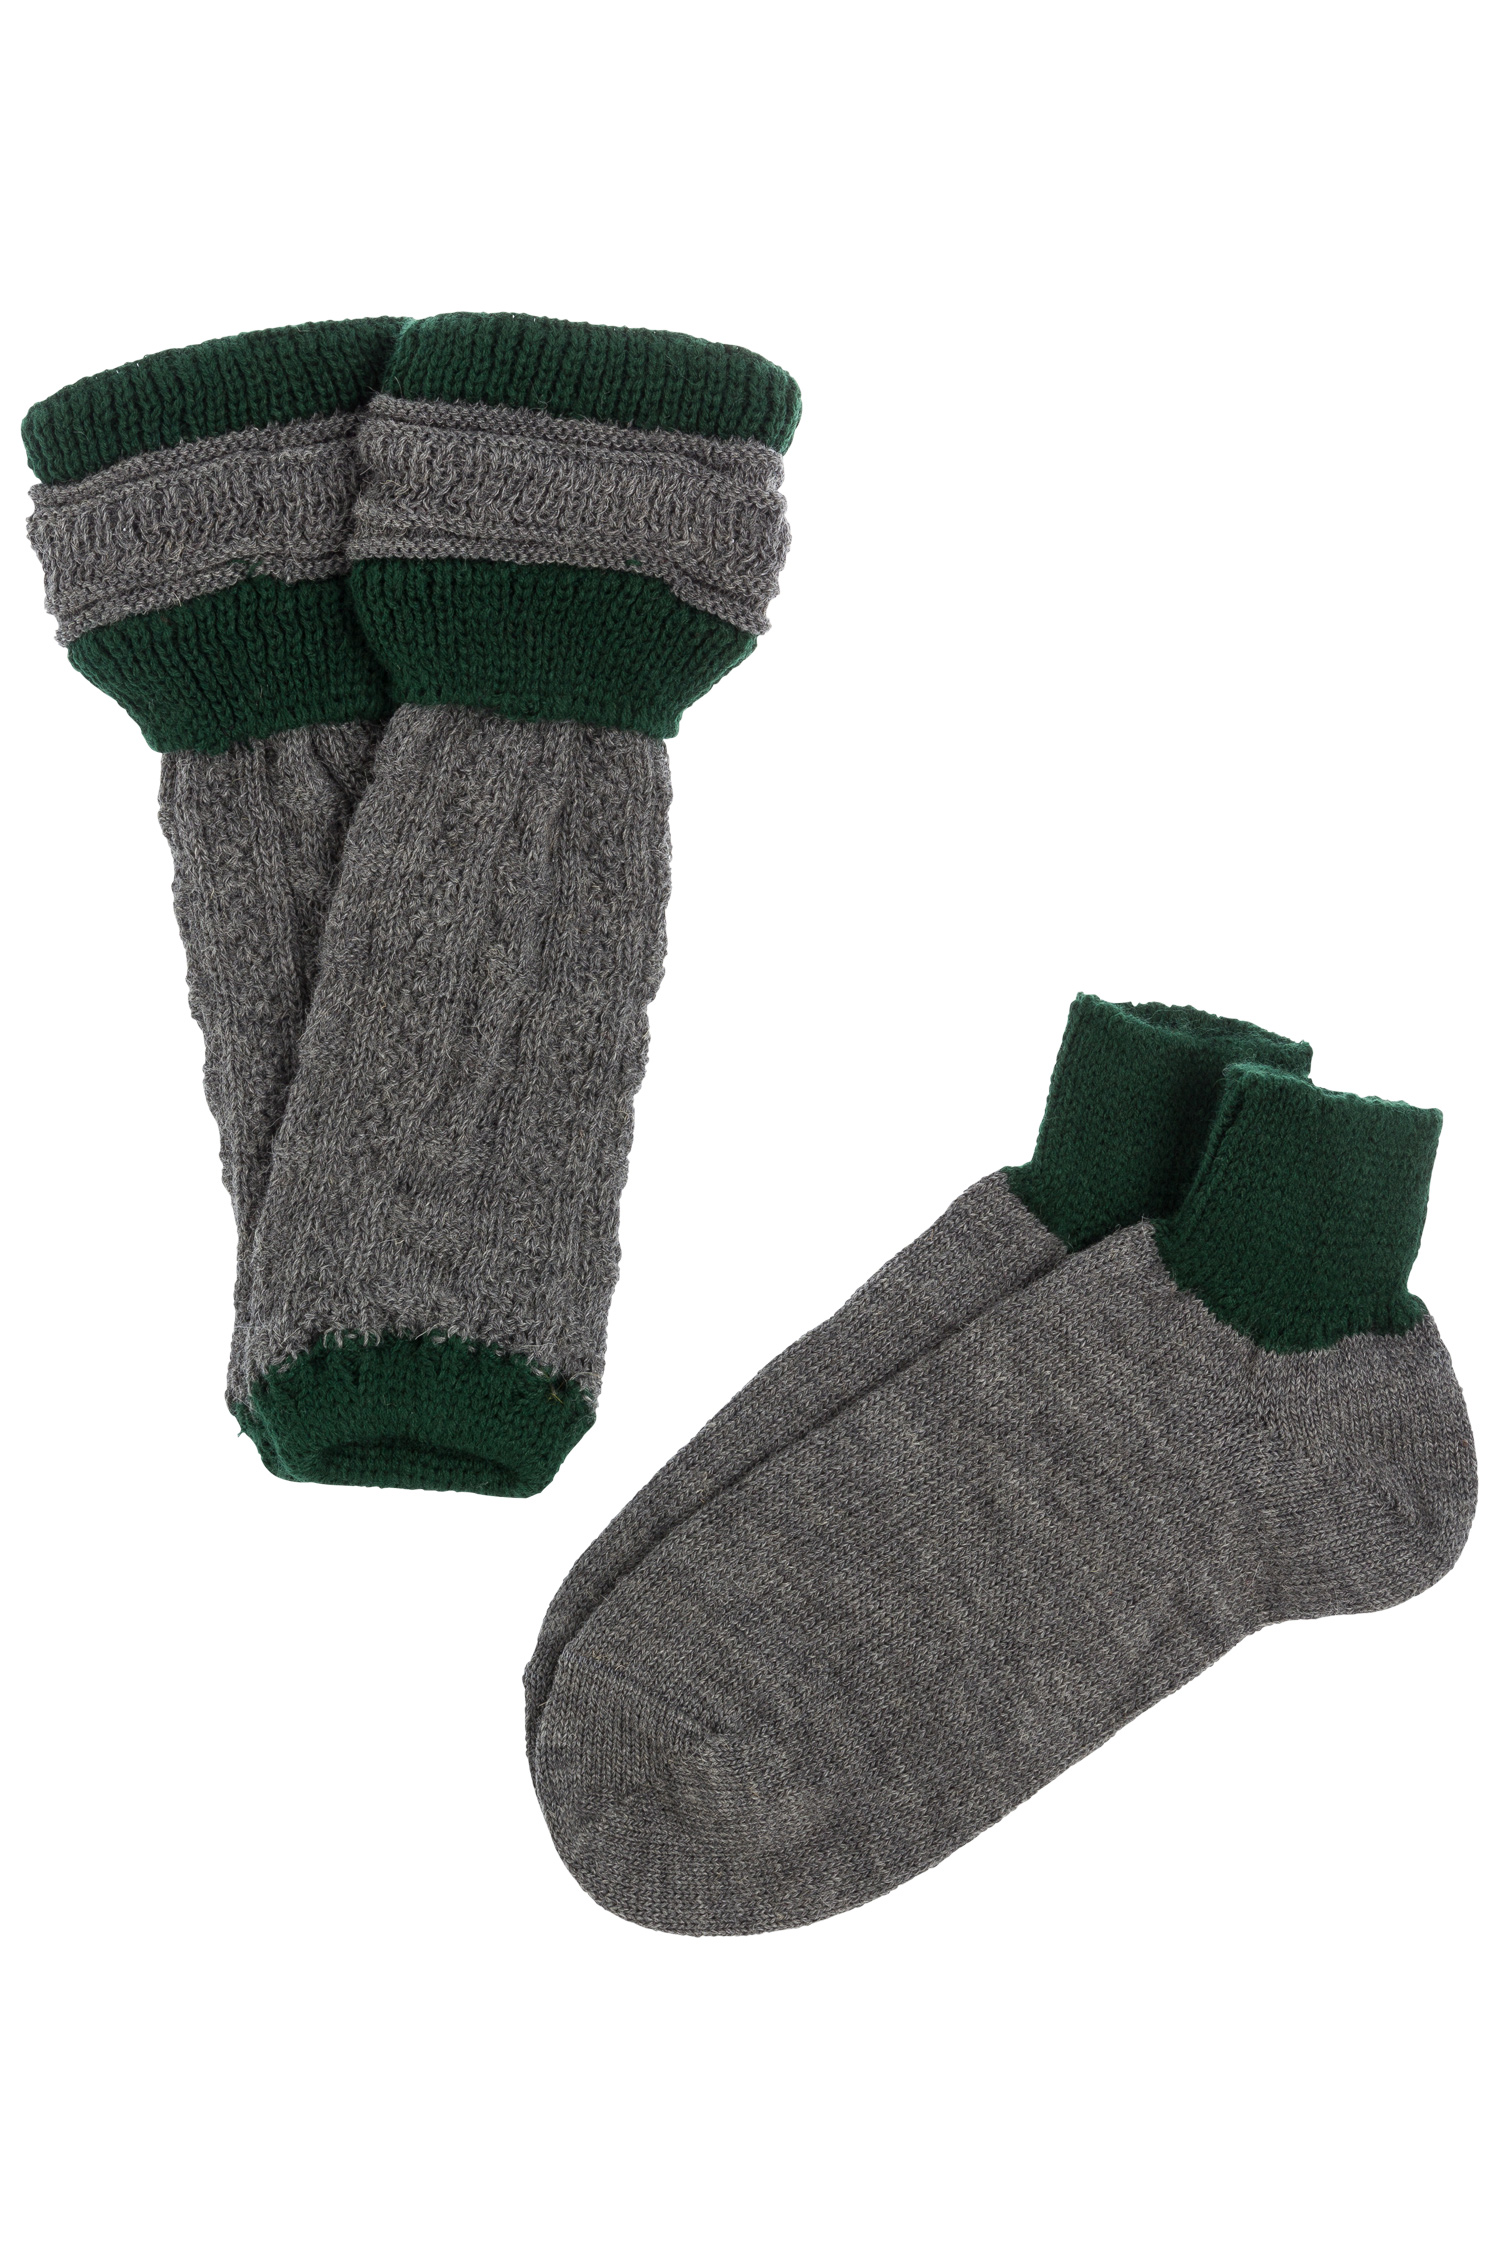 Loferl IV | grau-grün